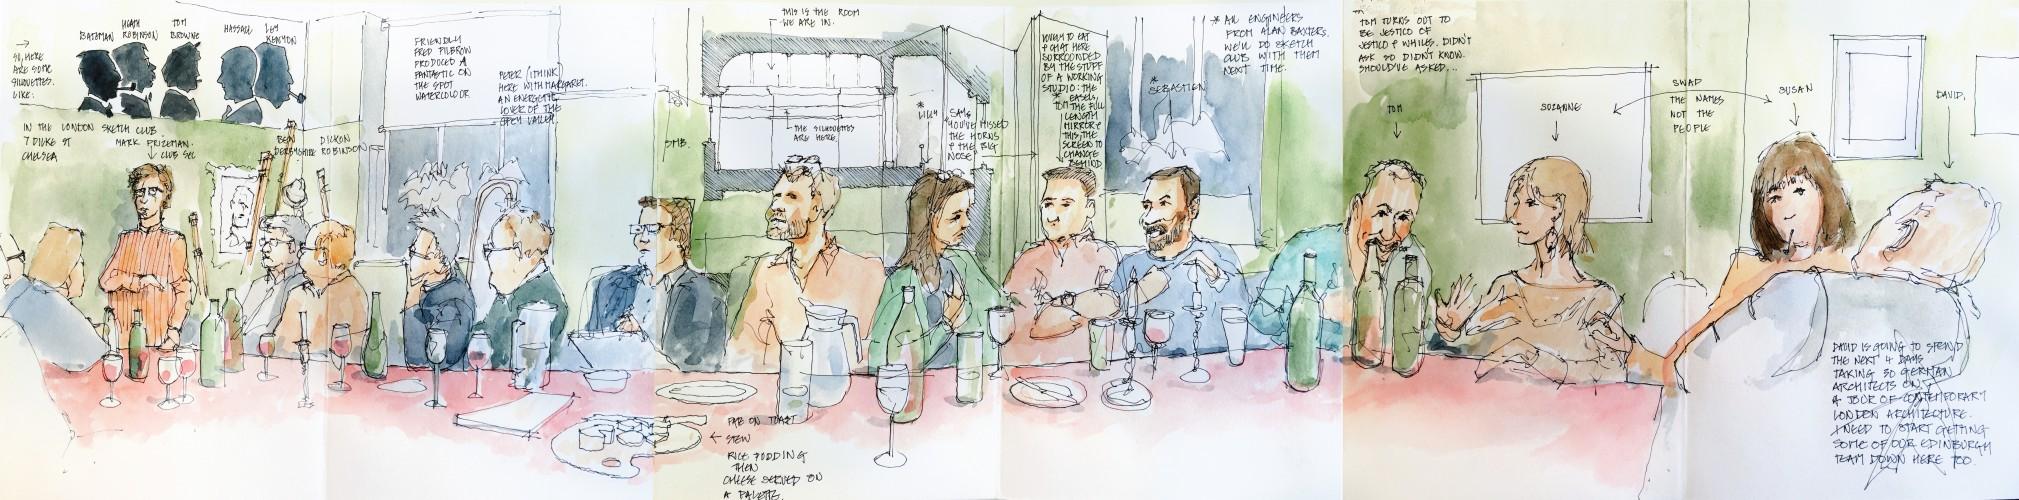 London Sketch Club - 30 September 2015